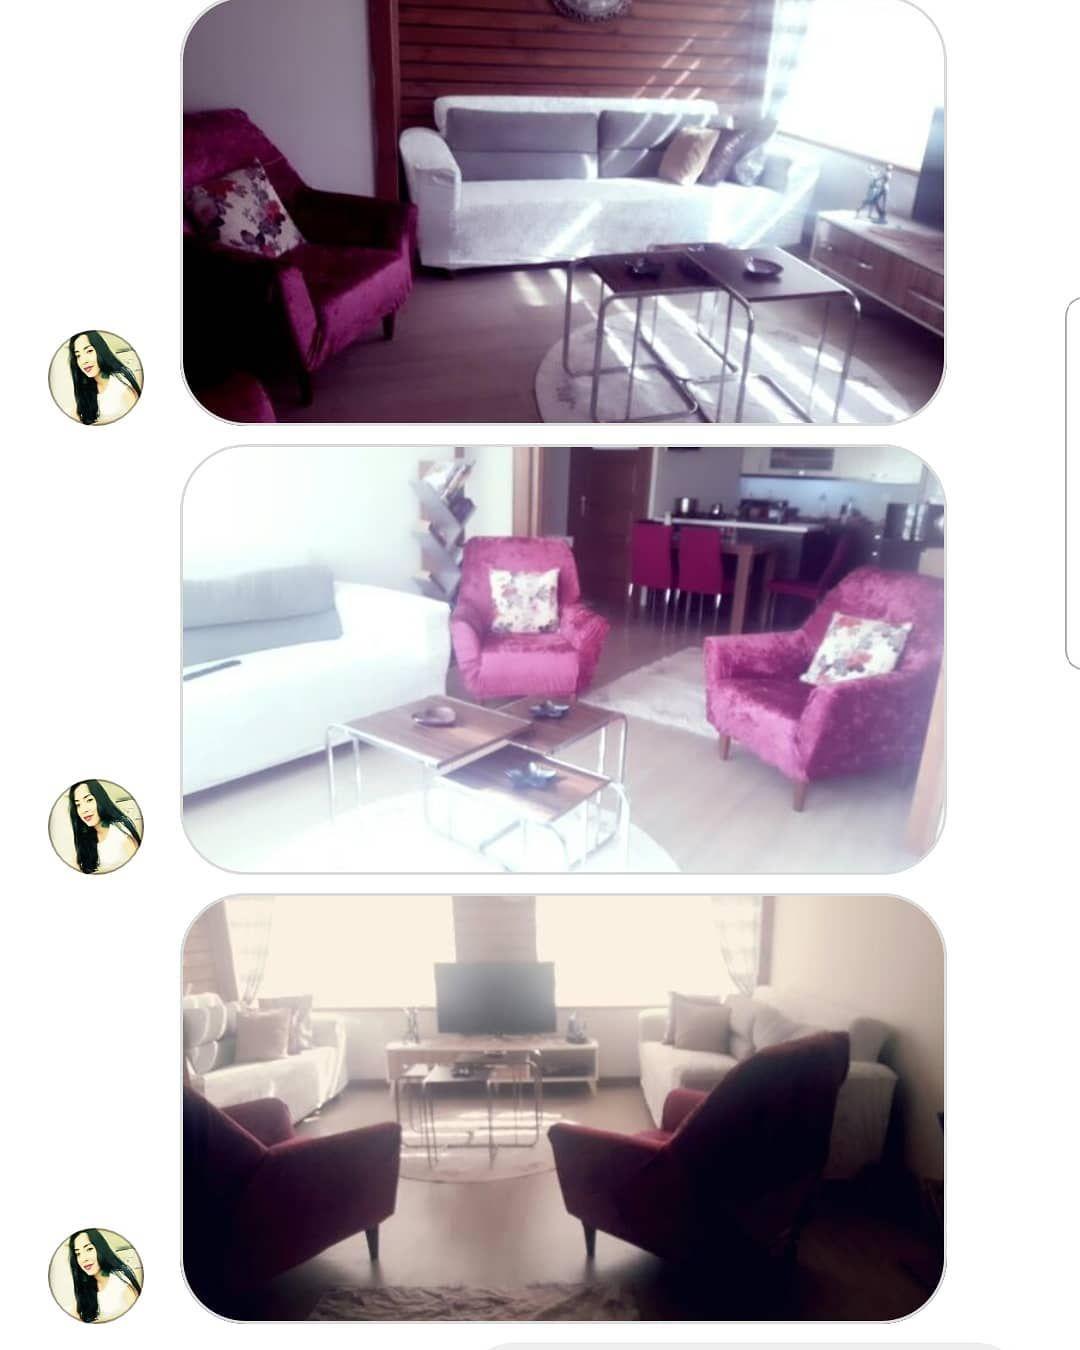 New The 10 Best Home Decor With Pictures Kadife Likrali Koltuk Ortusu Hos Bir Tasarimla Koltugu Sararak Koltu With Images Interior Decor Interior Design Home Decor